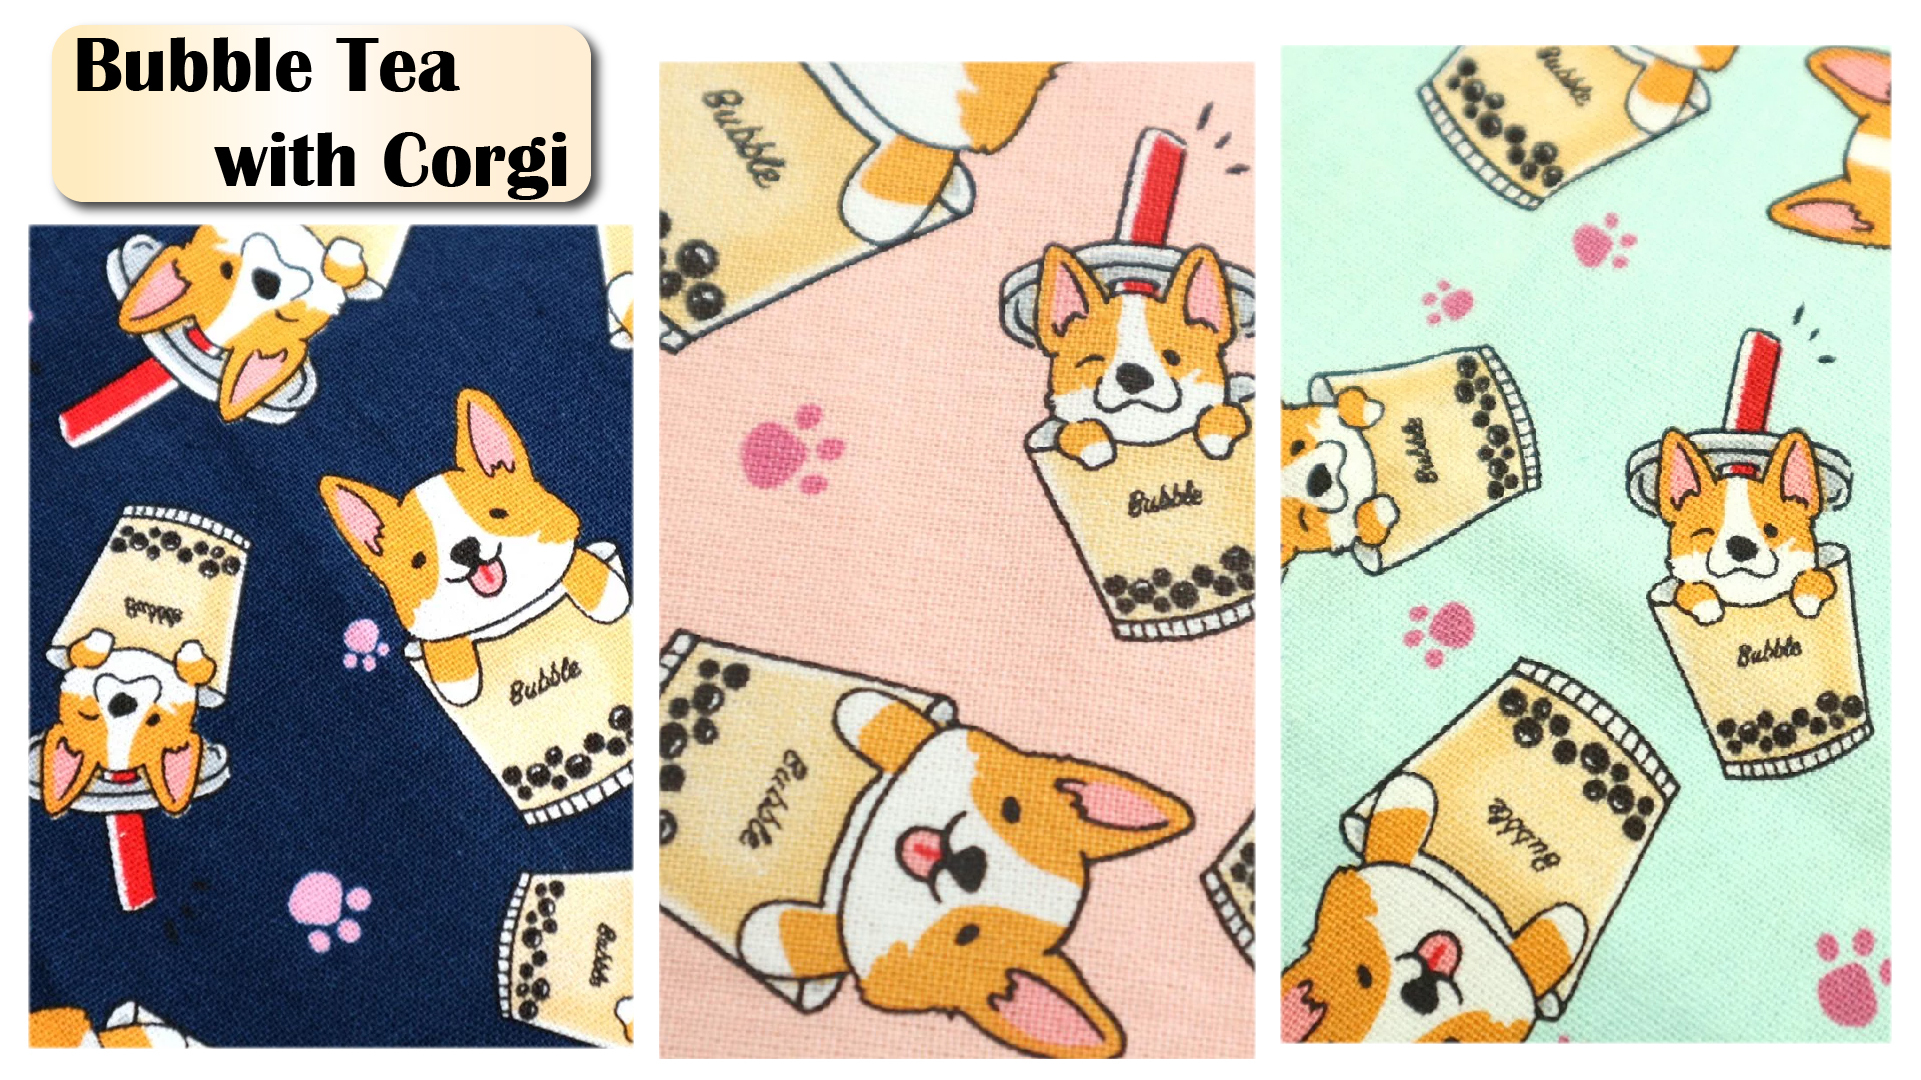 handmade taiwanfabric cottonfabric cute printing corgi bubblet ea